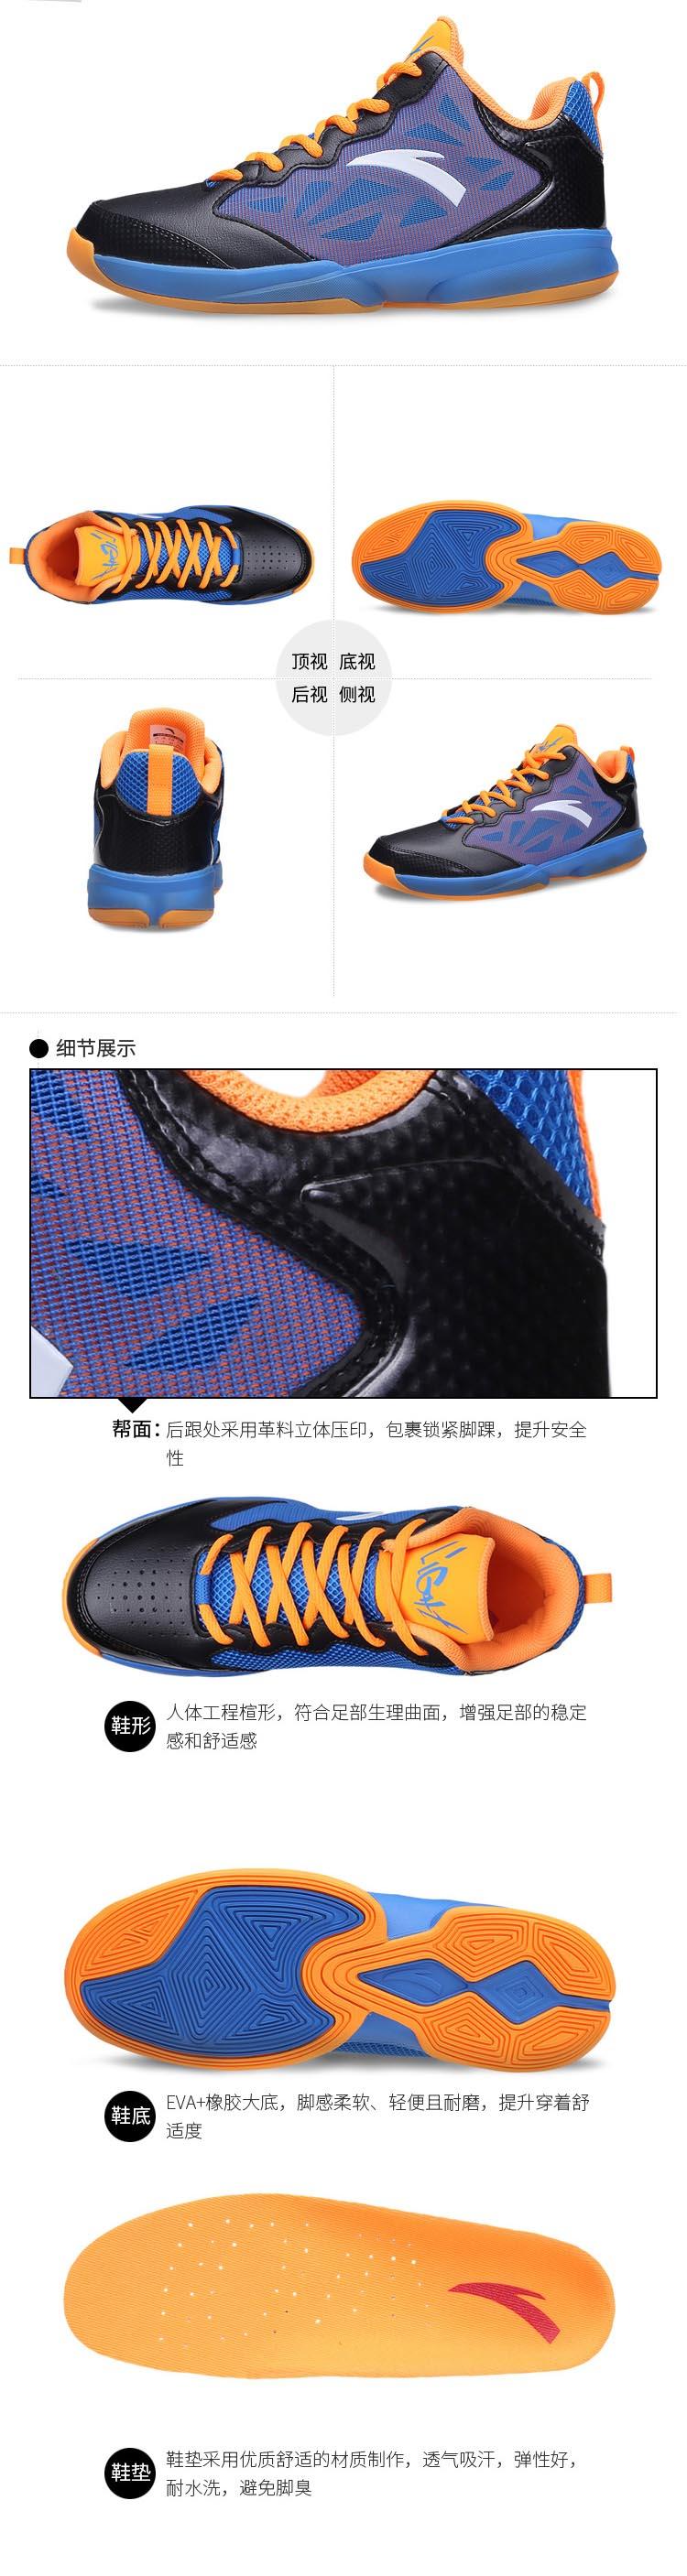 Anta 2016 Summer New Professional Basketball Shoes -  Black/Orange/Blue